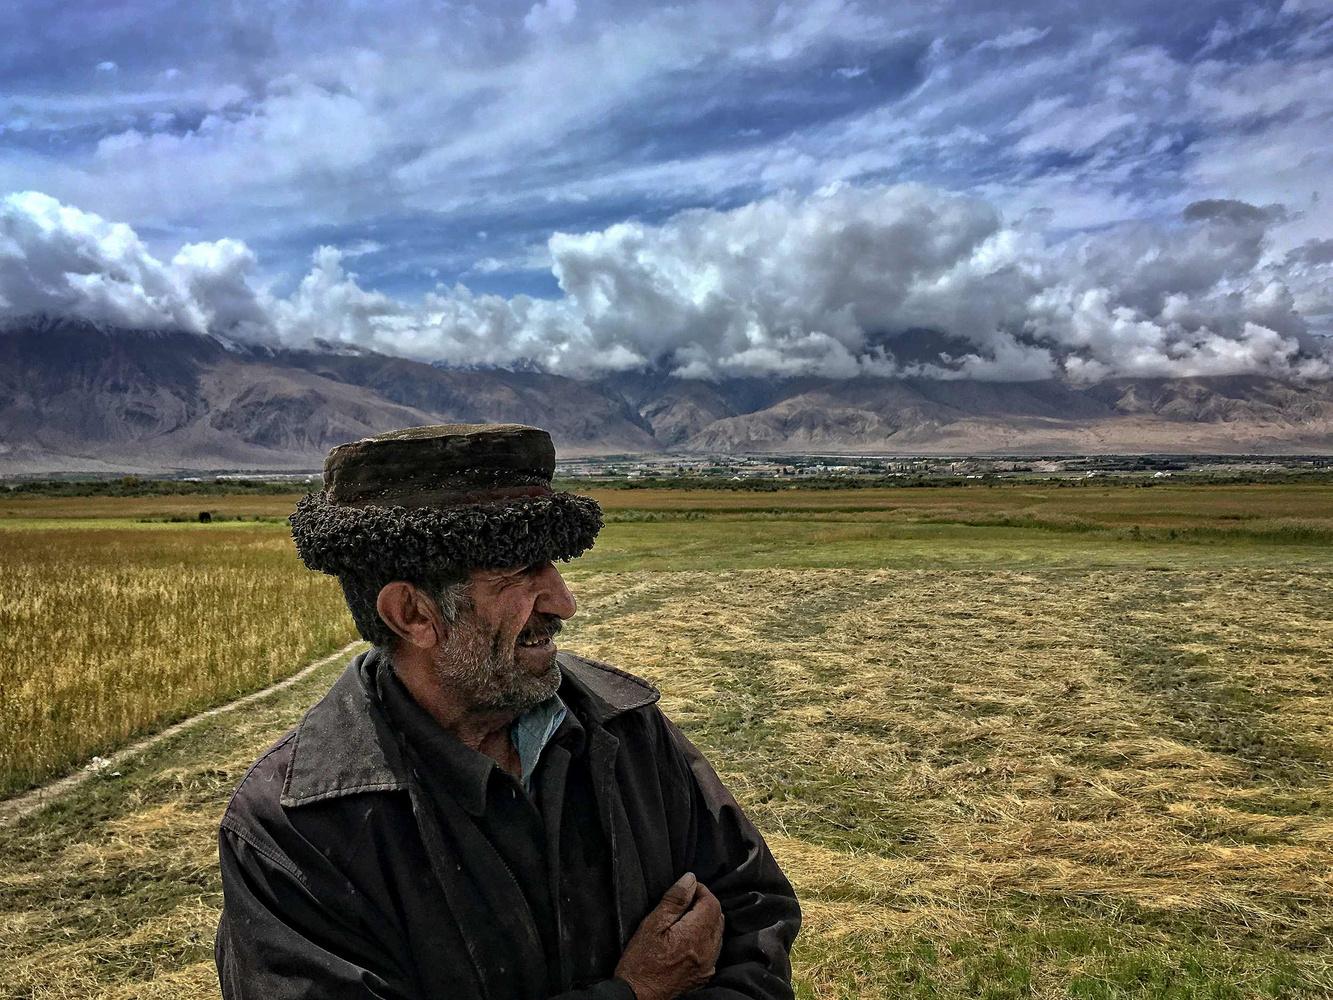 Harvest Man by Ira Jacob